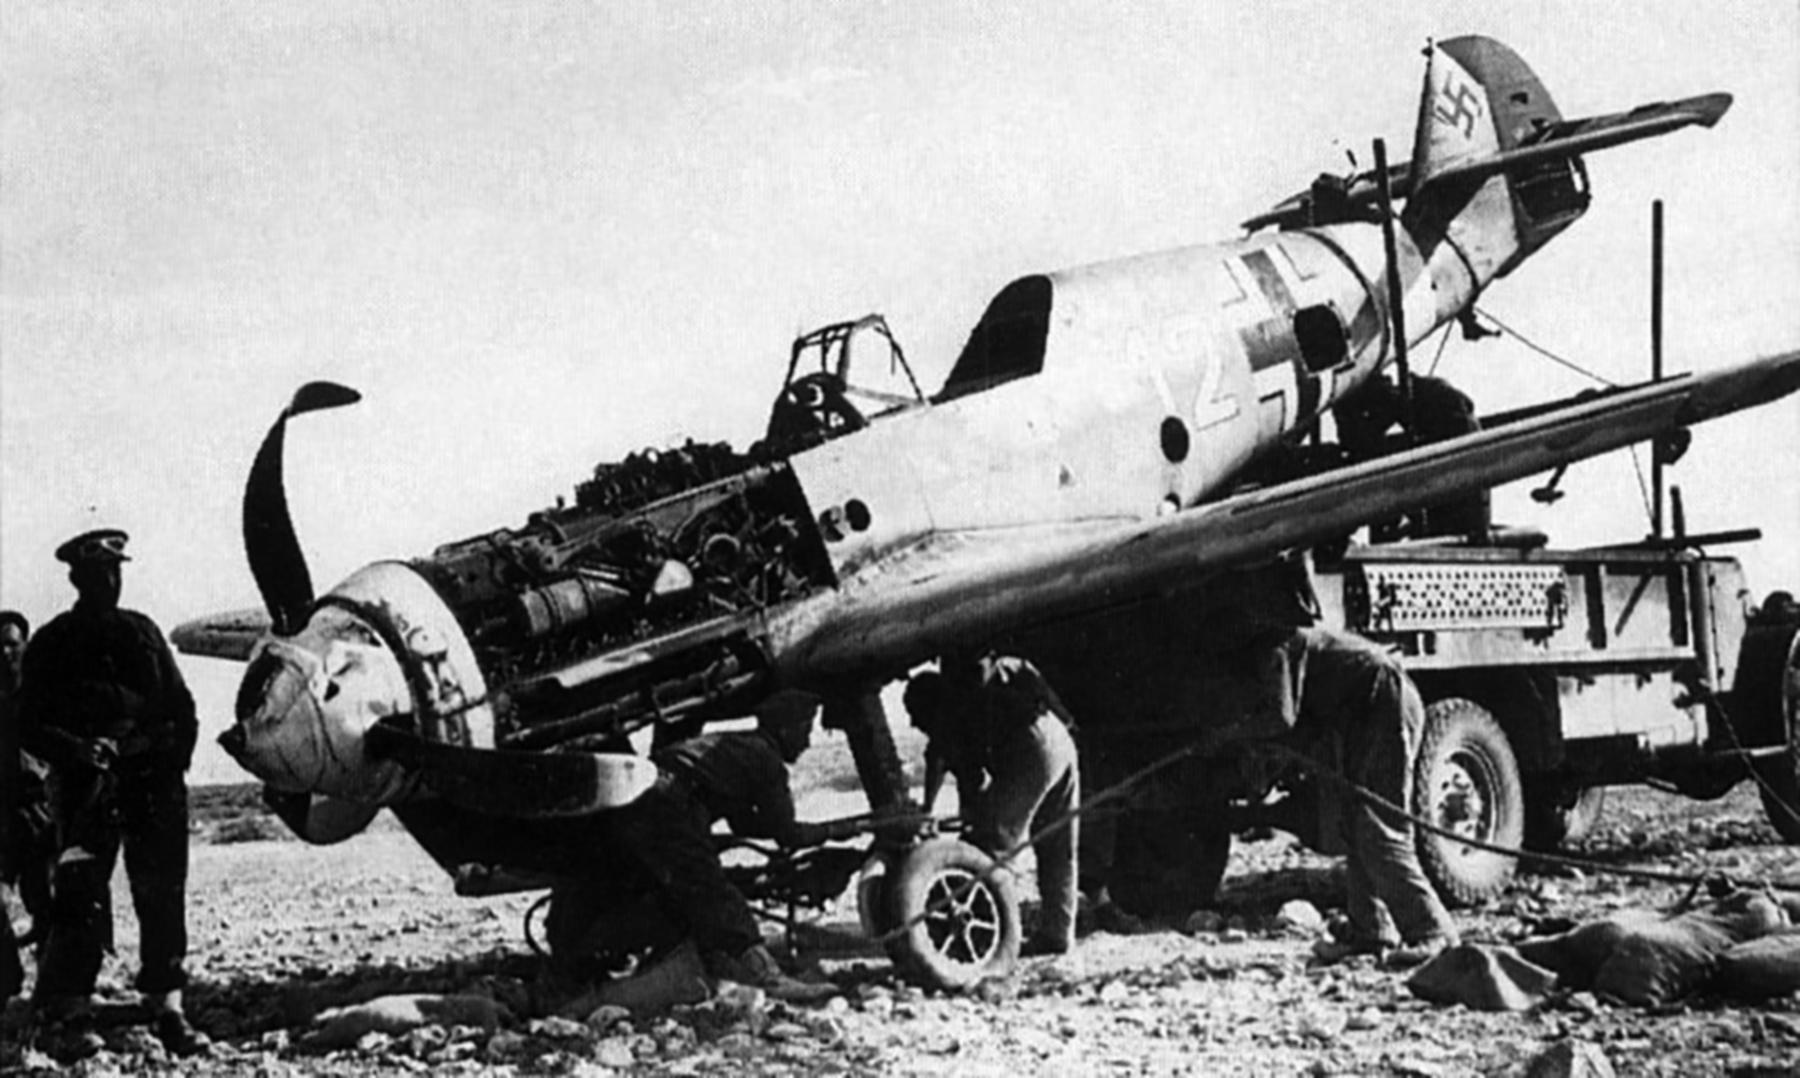 Messerschmitt Bf 109F4Trop 4.JG27 White 12 WNr 8438 El Gazala Dec 1941 04